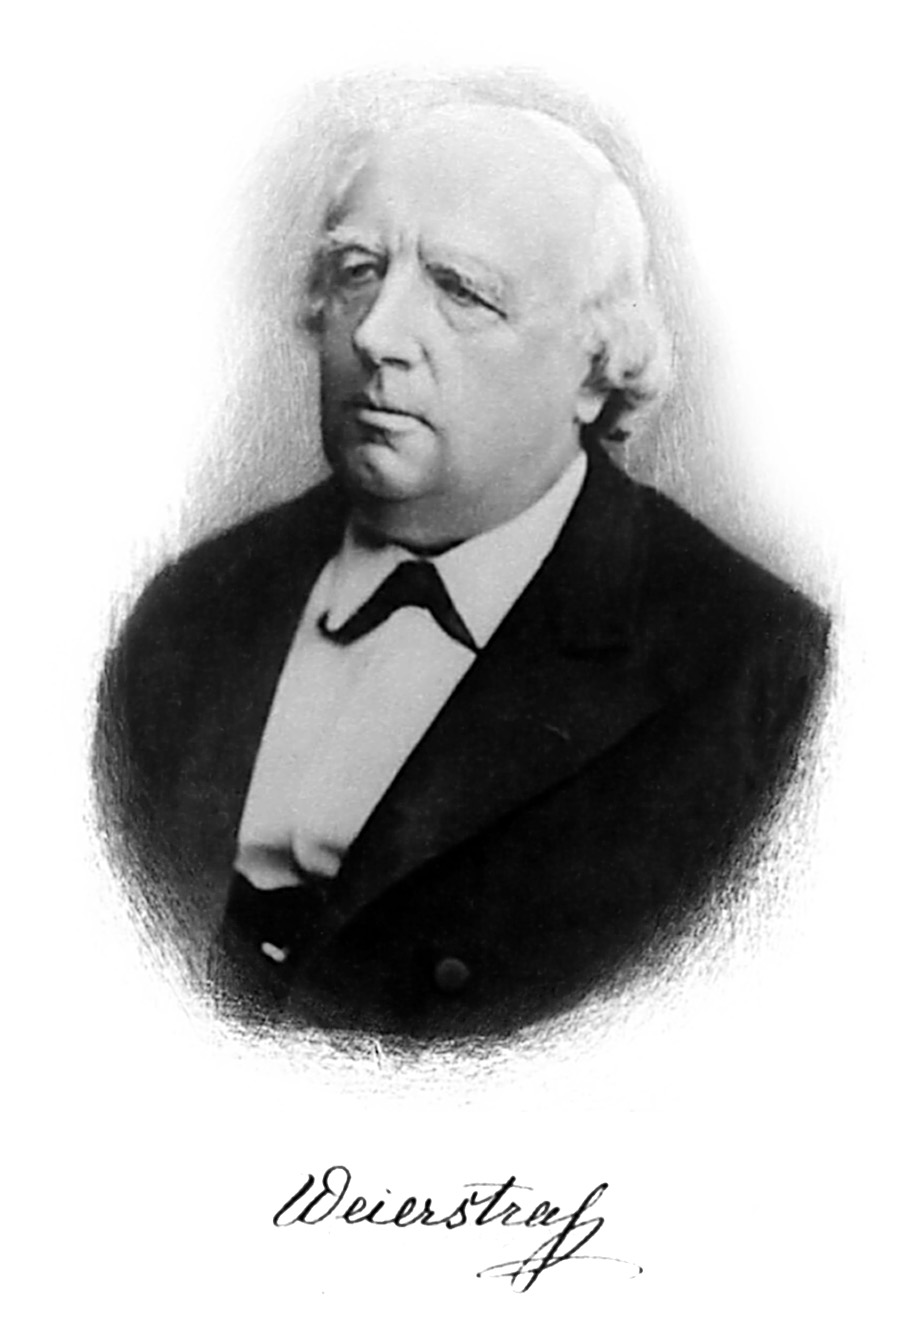 http://upload.wikimedia.org/wikipedia/commons/f/f1/Karl_Weierstrass.jpg